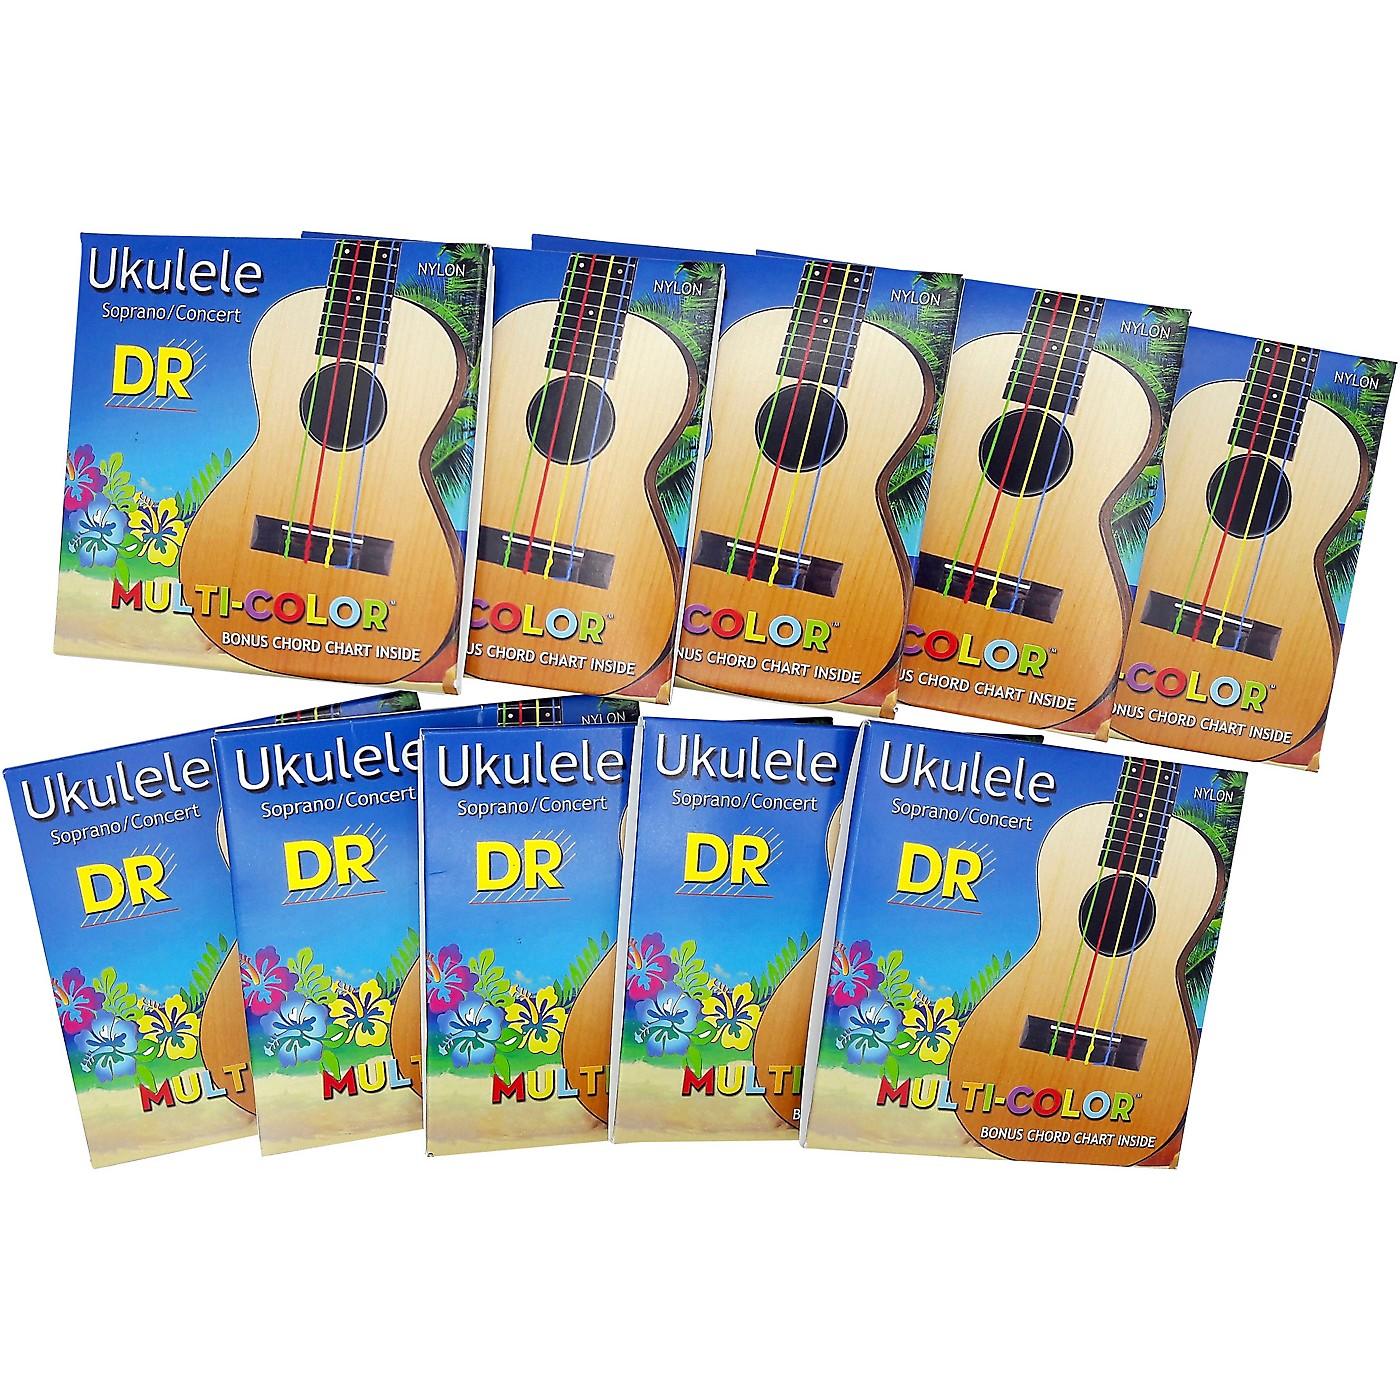 DR Strings 10-Pack Ukulele Multi-Color Soprano Concert Strings thumbnail